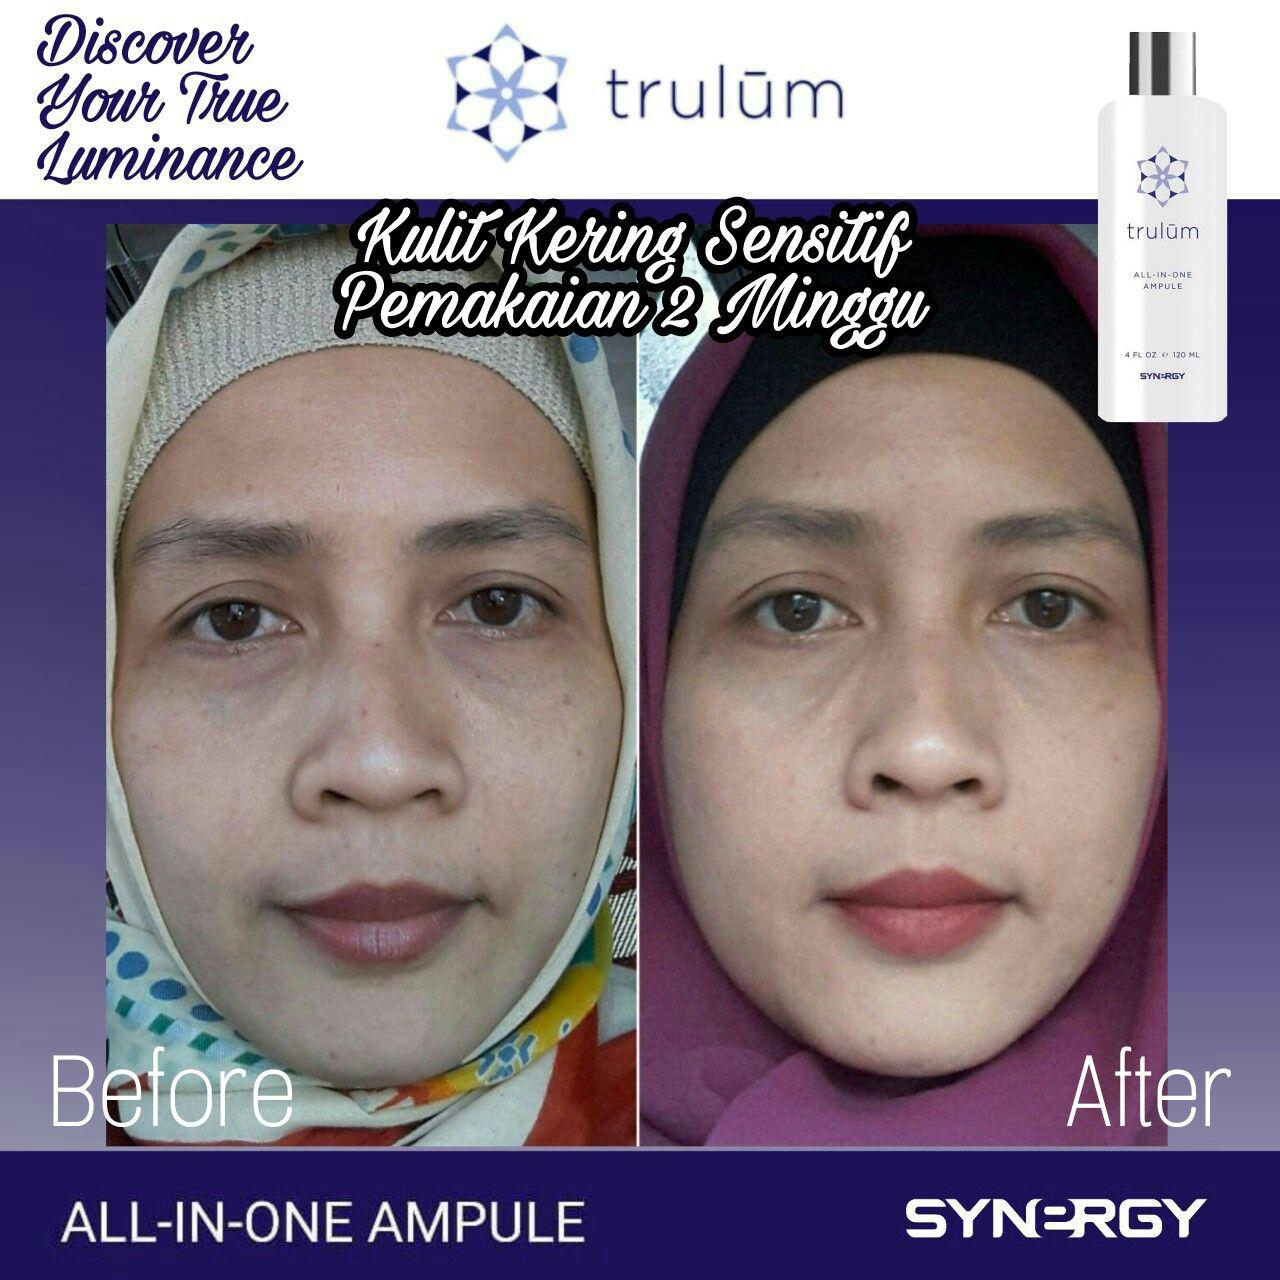 Klinik Kecantikan Trulum Indonesia Di Abeli, Kota Kendari WA: 08112338376